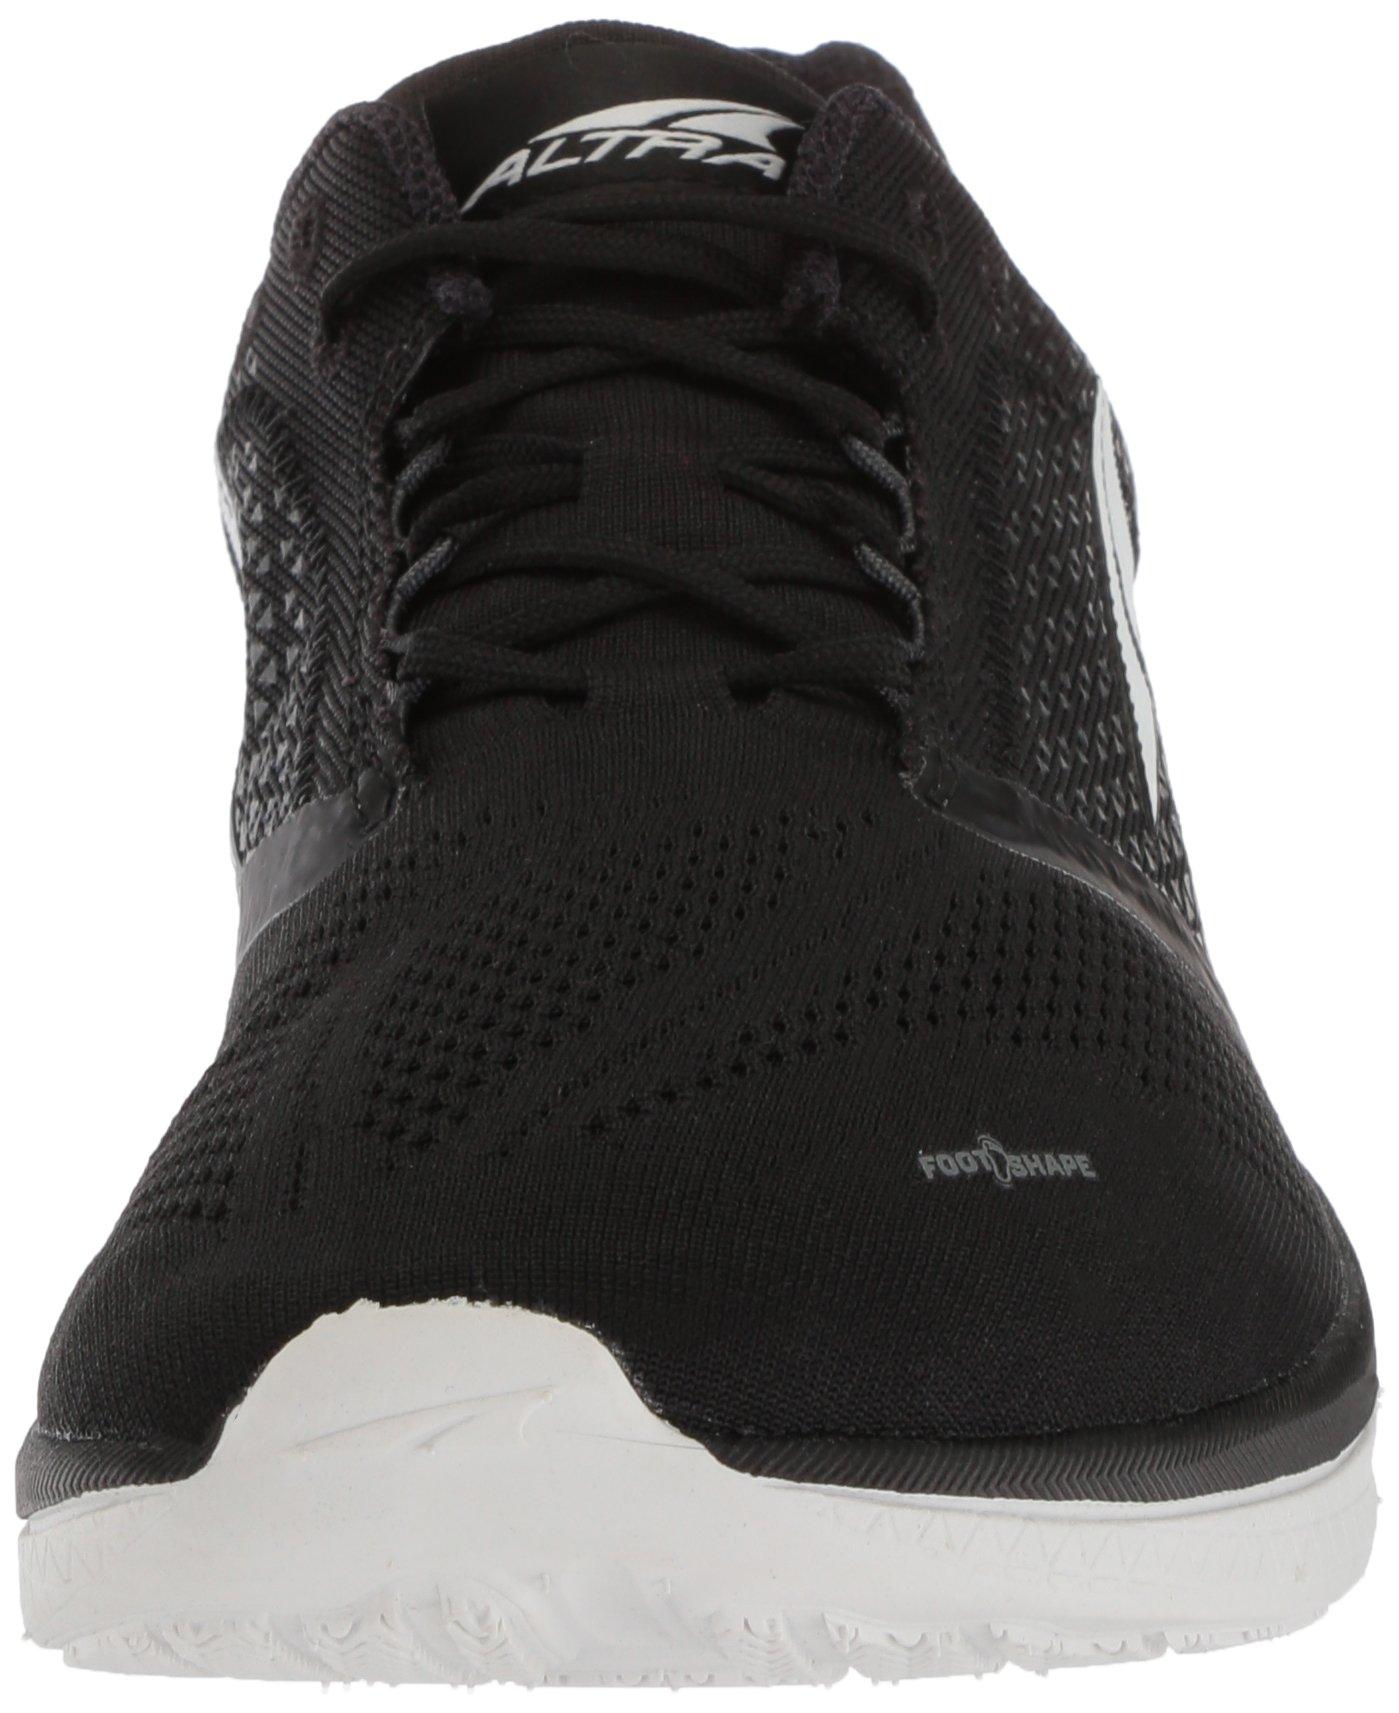 Altra Men's Solstice Sneaker Black 8.5 Regular US by Altra (Image #4)